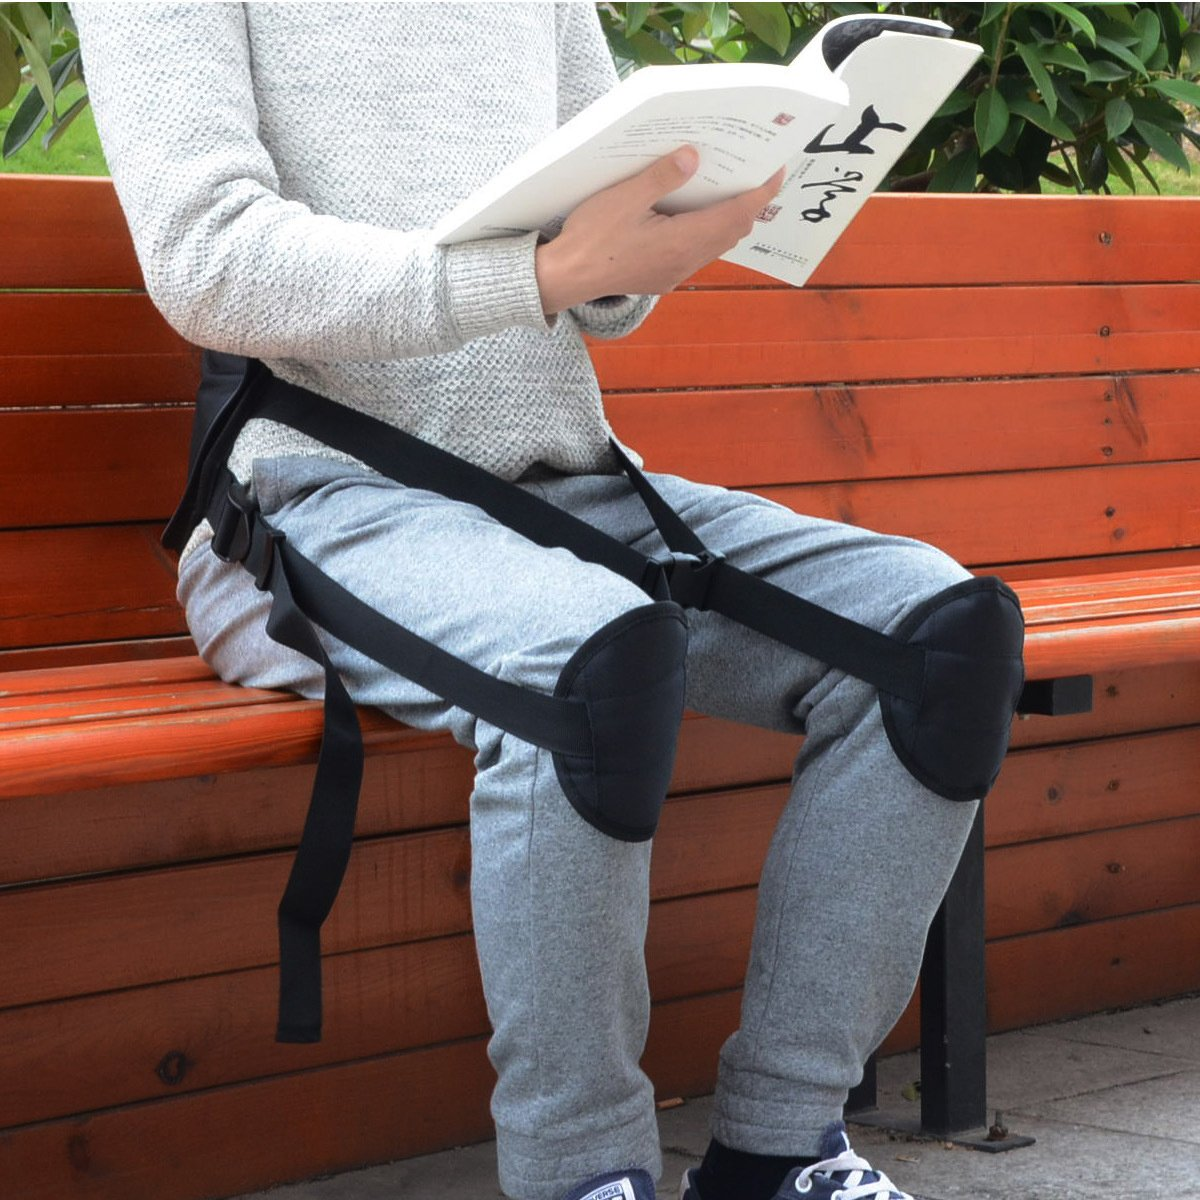 Ueasy Adjustable Back Posture Corrector Brace Clavicle Brace Portable Correct Back Posture for Correction Posture Enhance Temperament